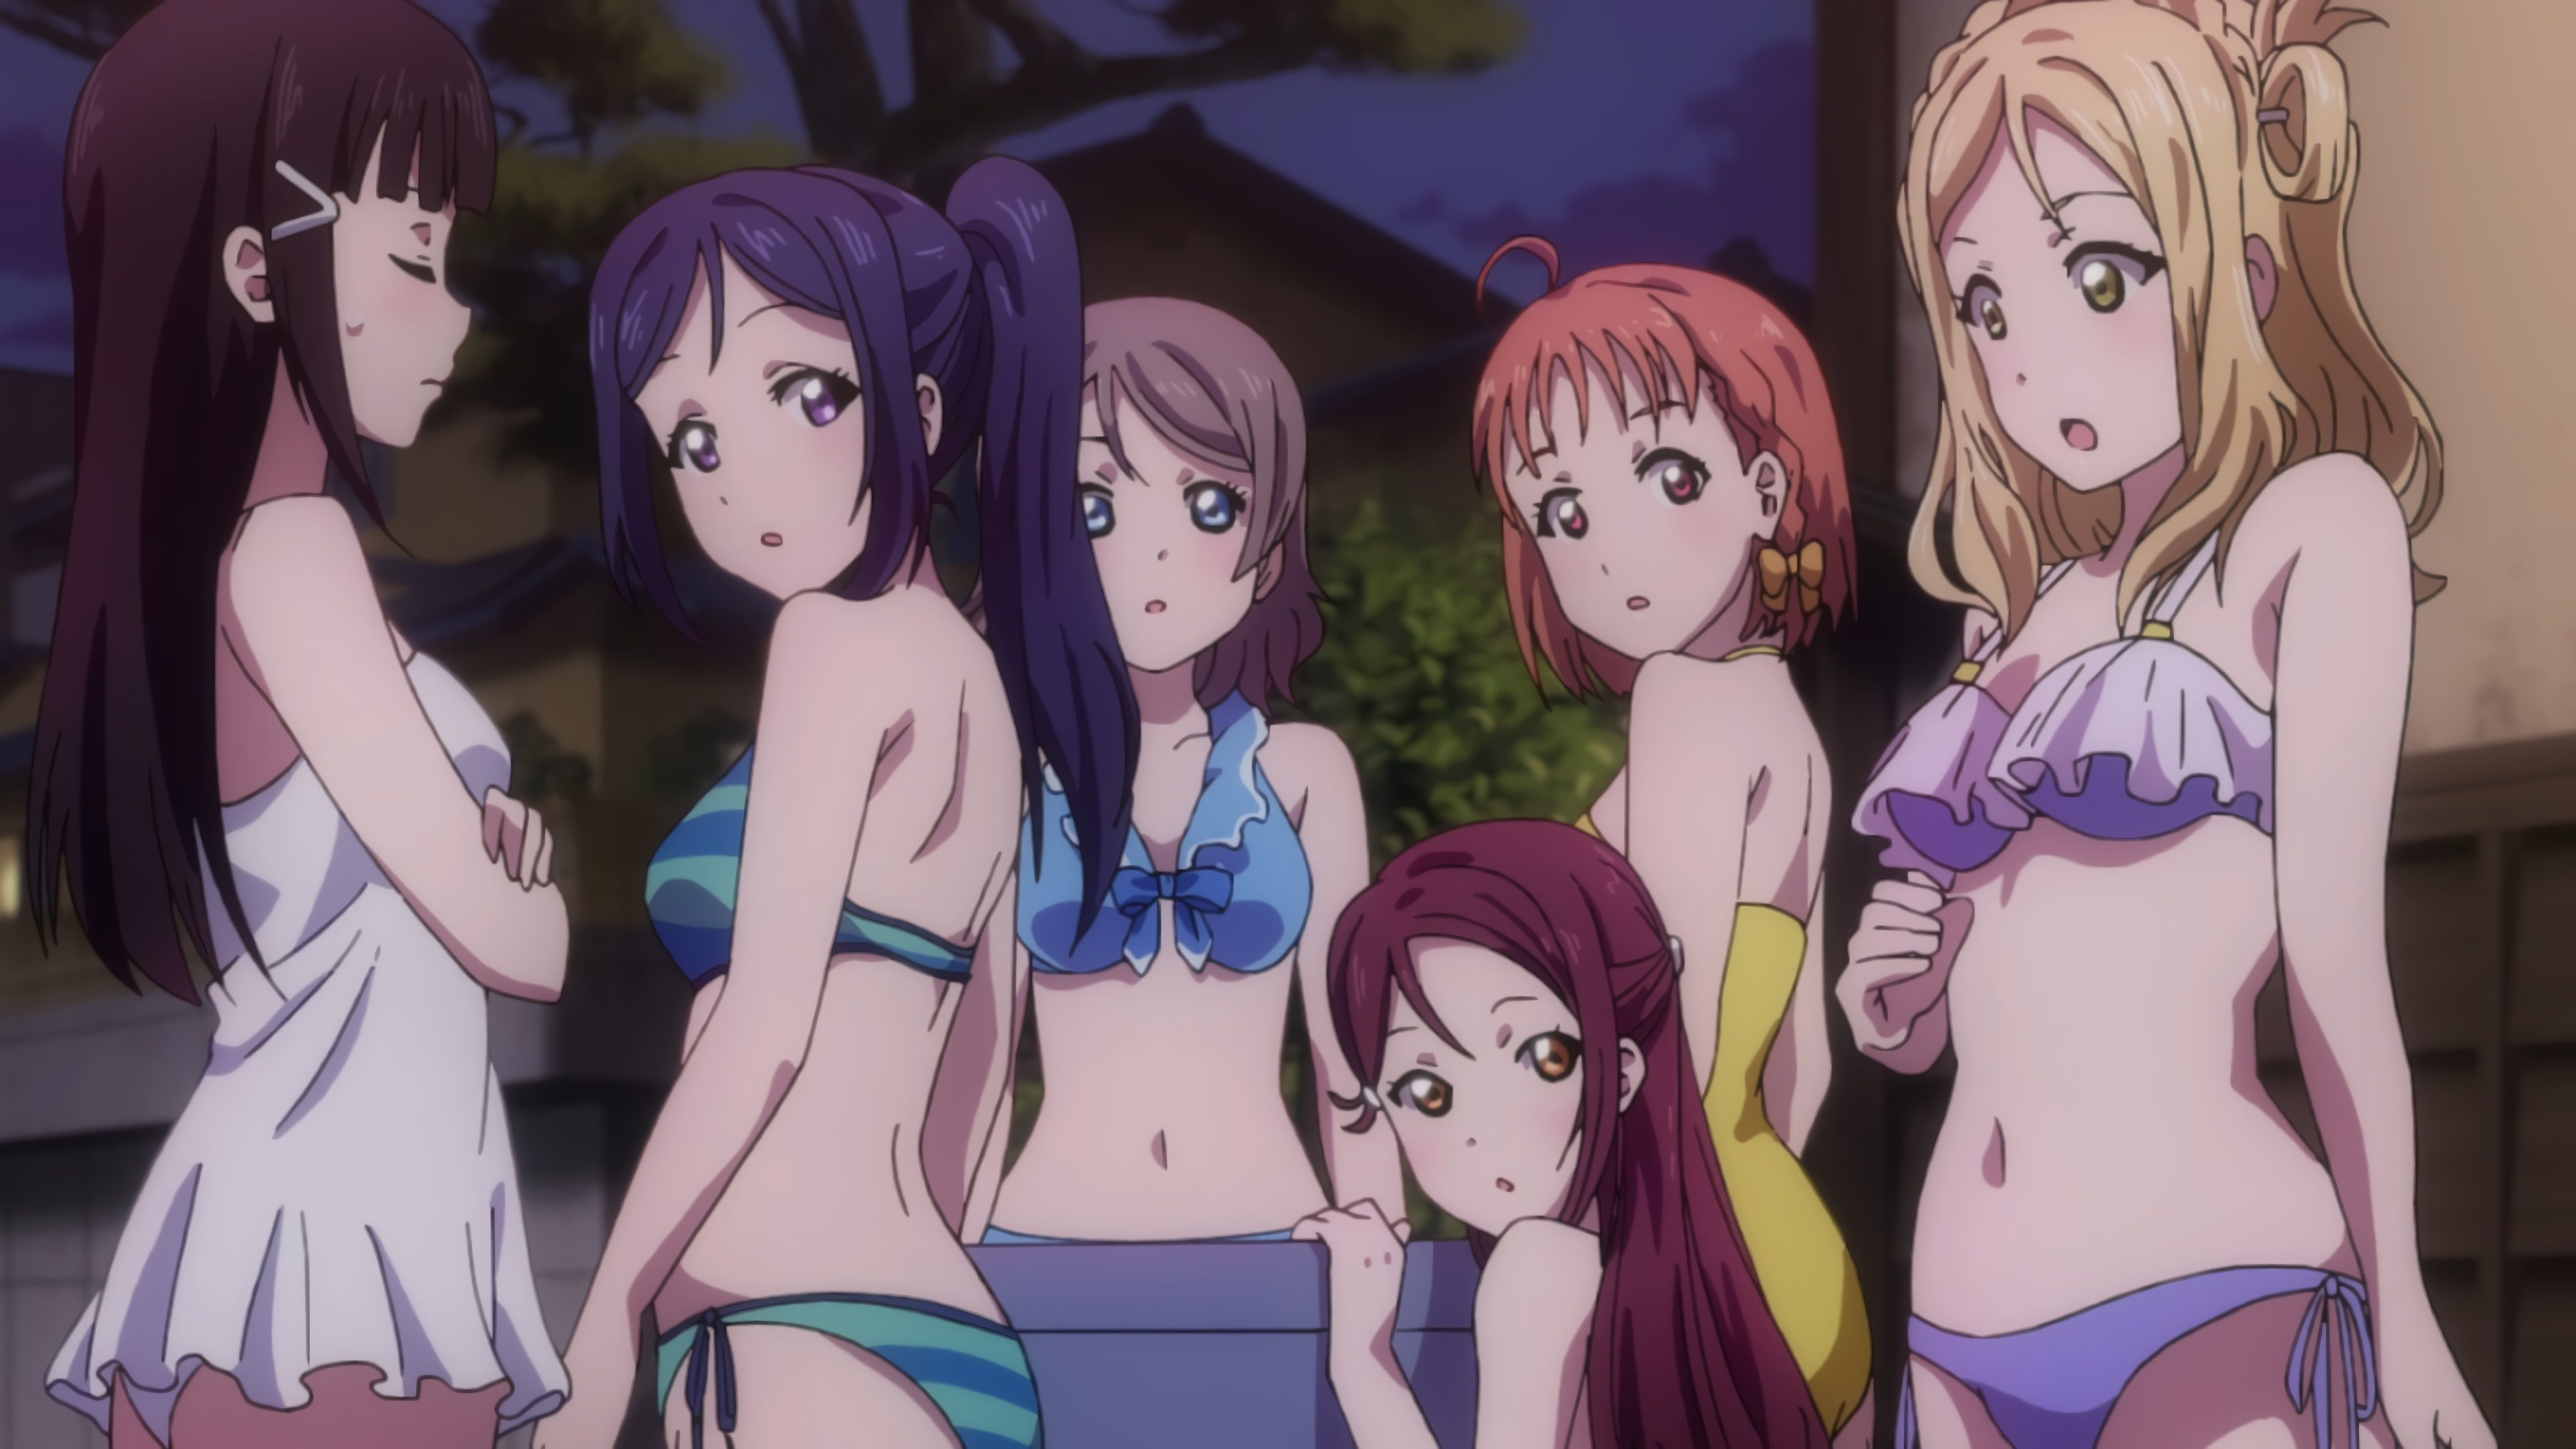 Hatsune Miku Kawaii ♥ Kawaii Anime Pinterest Hatsune